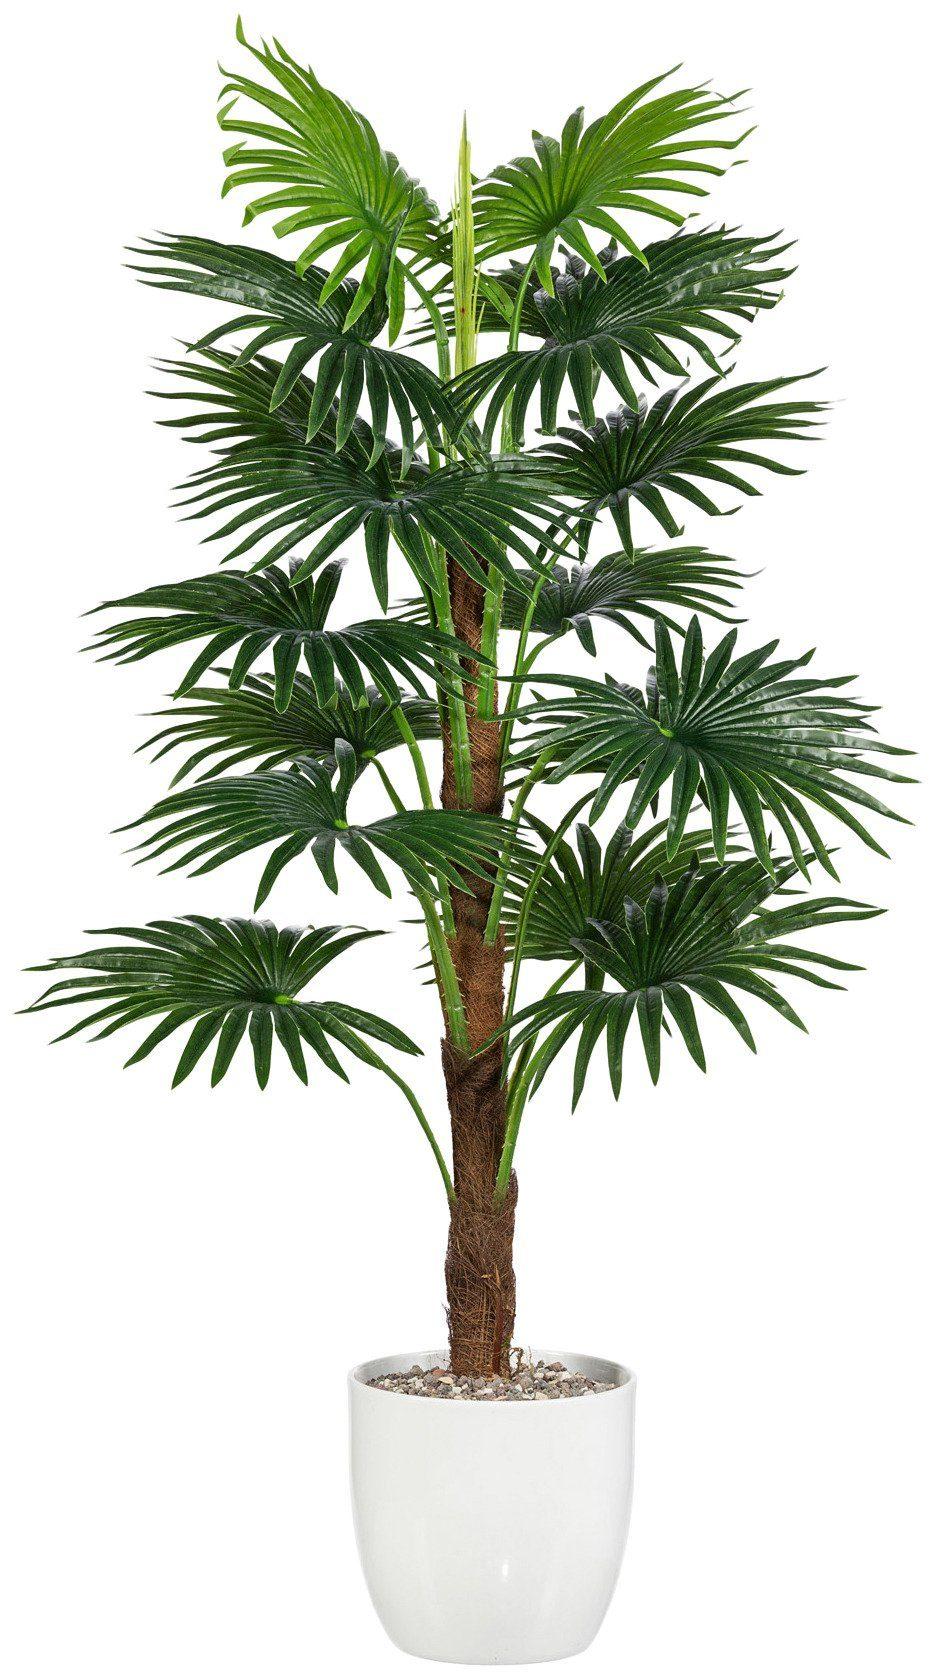 Kunstpflanze »Fächerpalme« inkl. Pflanzgefäß (H: 110 cm)